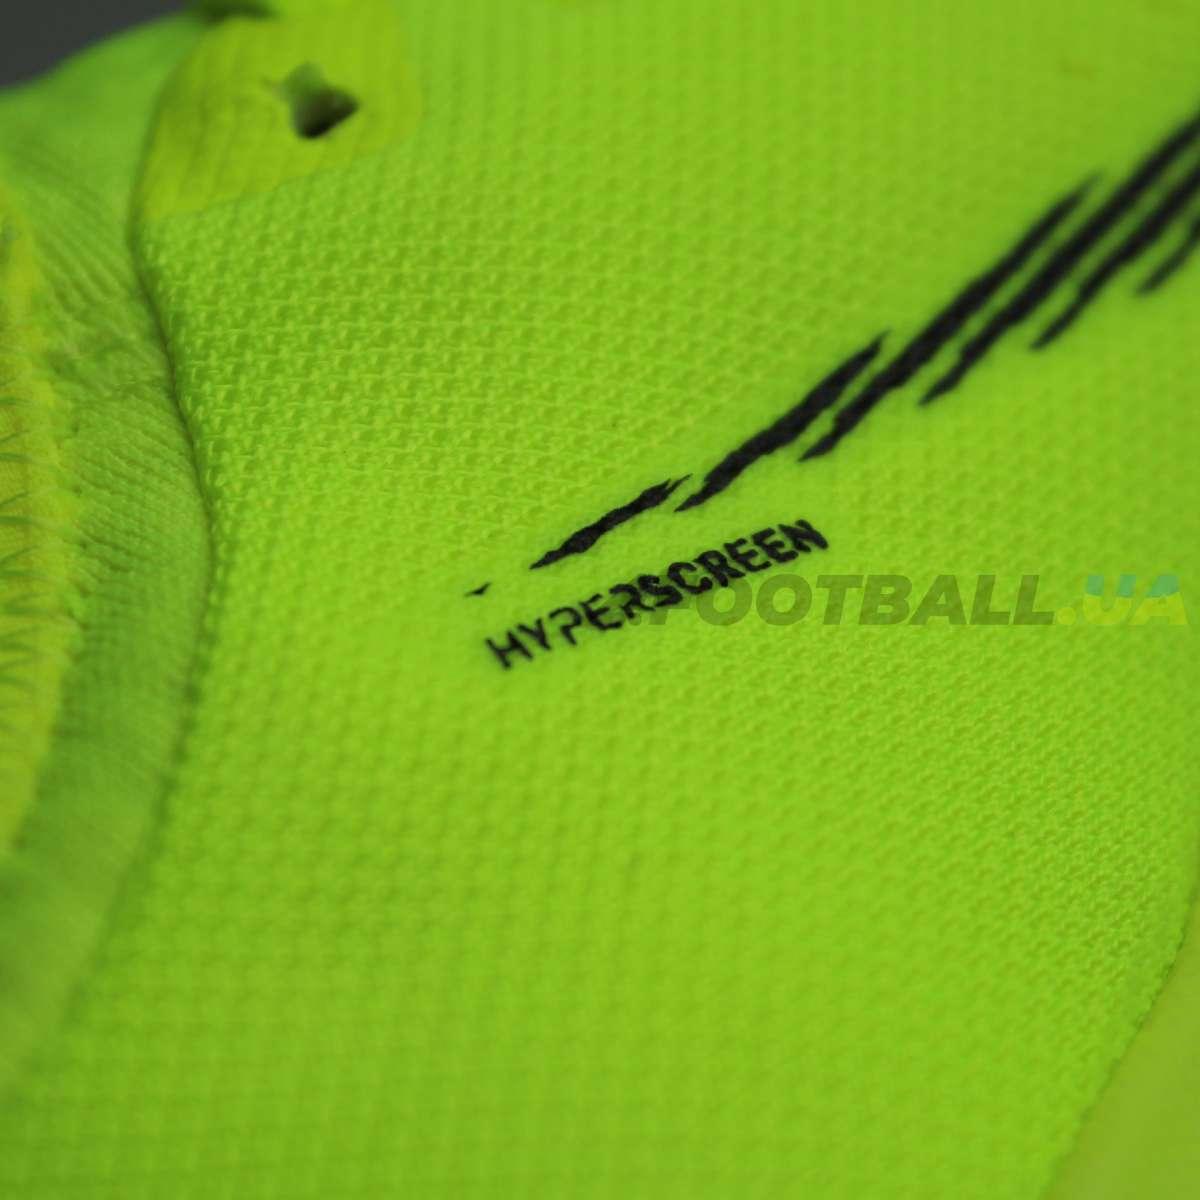 ... Сороконожки Nike Mercurial Vapor 12 Pro AH7388-701 3 ... 9f26d9535df7c